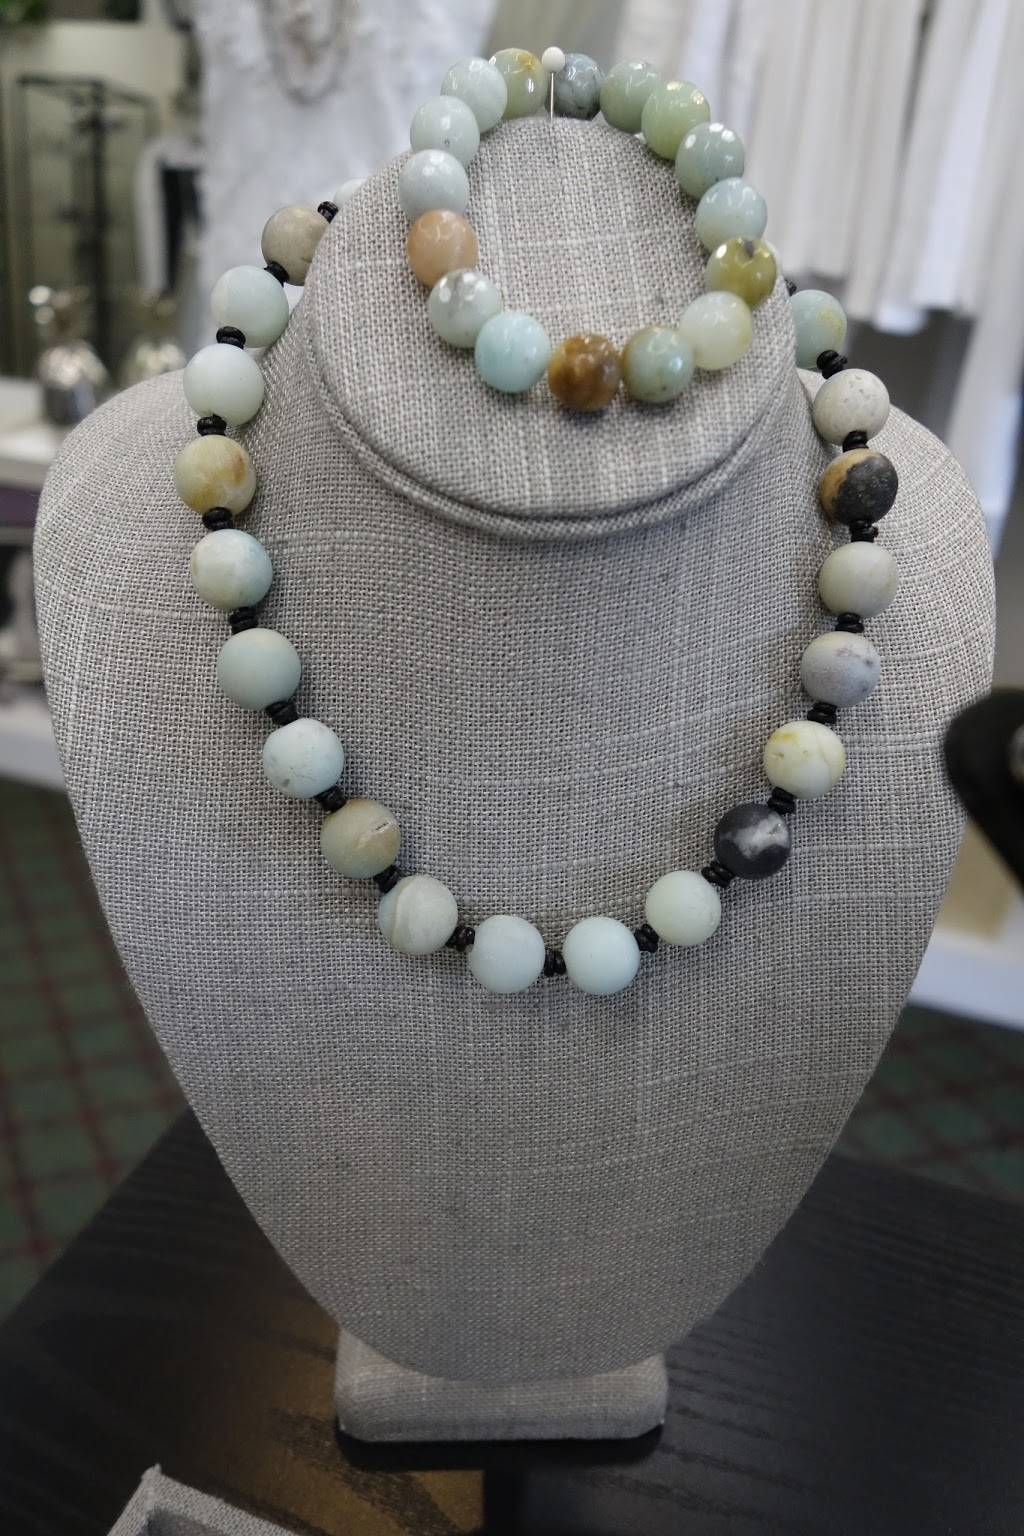 Perfect Fit Design & Alterations - clothing store  | Photo 1 of 8 | Address: 924 Huntington Dr, San Marino, CA 91108, USA | Phone: (626) 300-0074